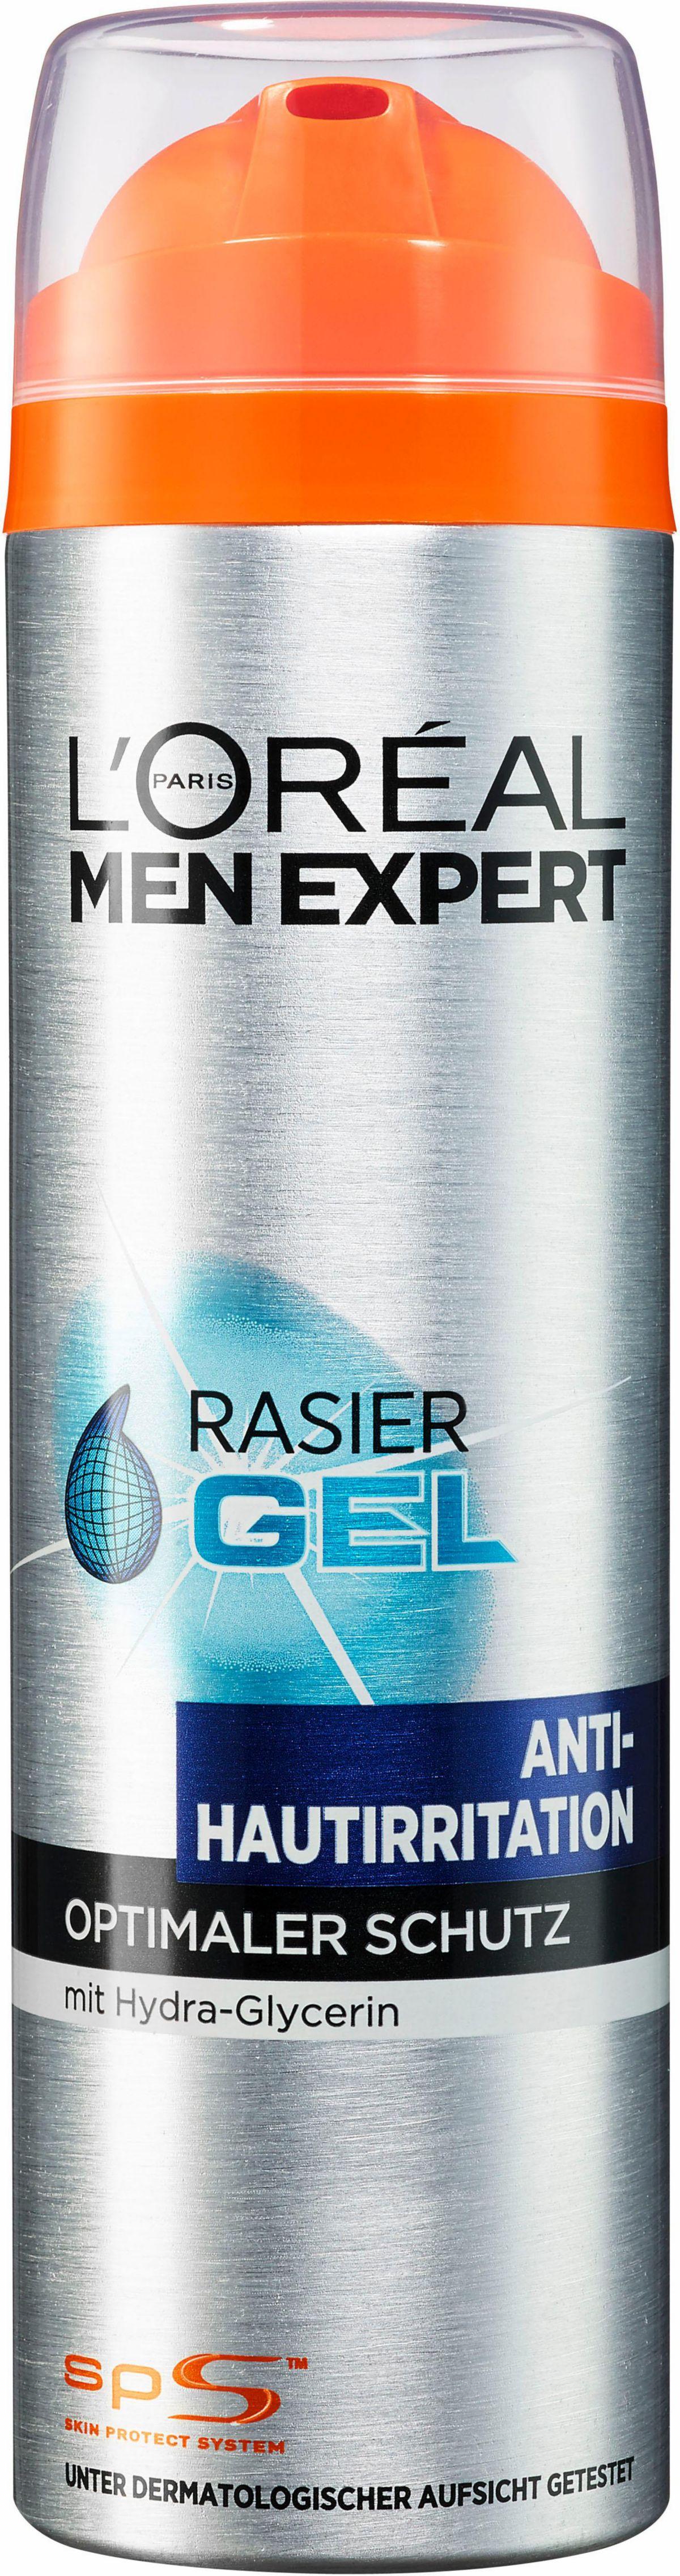 L´Oréal Paris Men Expert, »Hydra Energy Rasiergel Anti-Hautirritation«, Rasiergel/-schaum